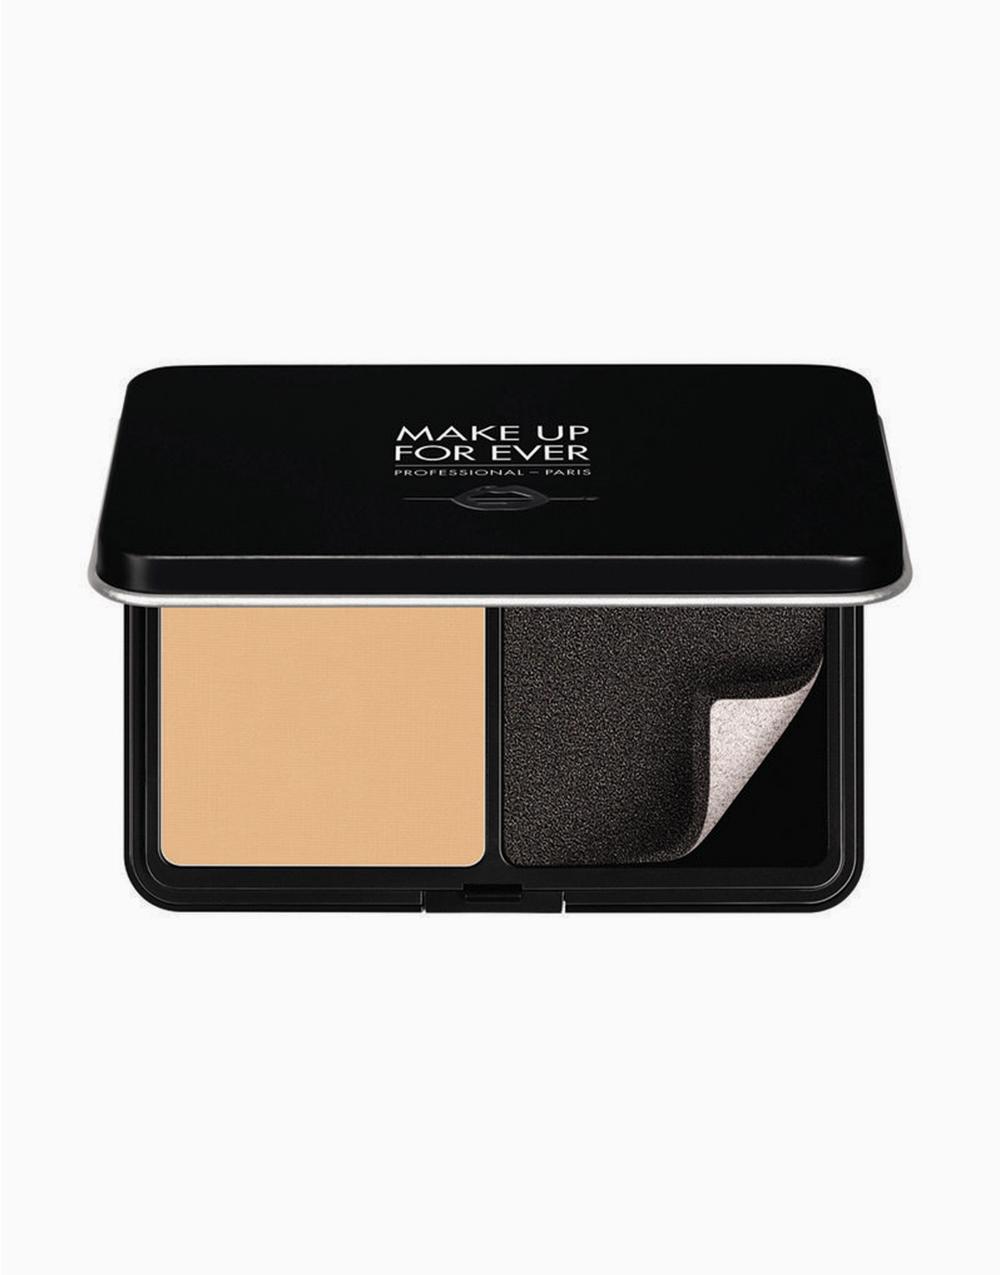 Matte Velvet Skin Compact (11g) by Make Up For Ever | Y235